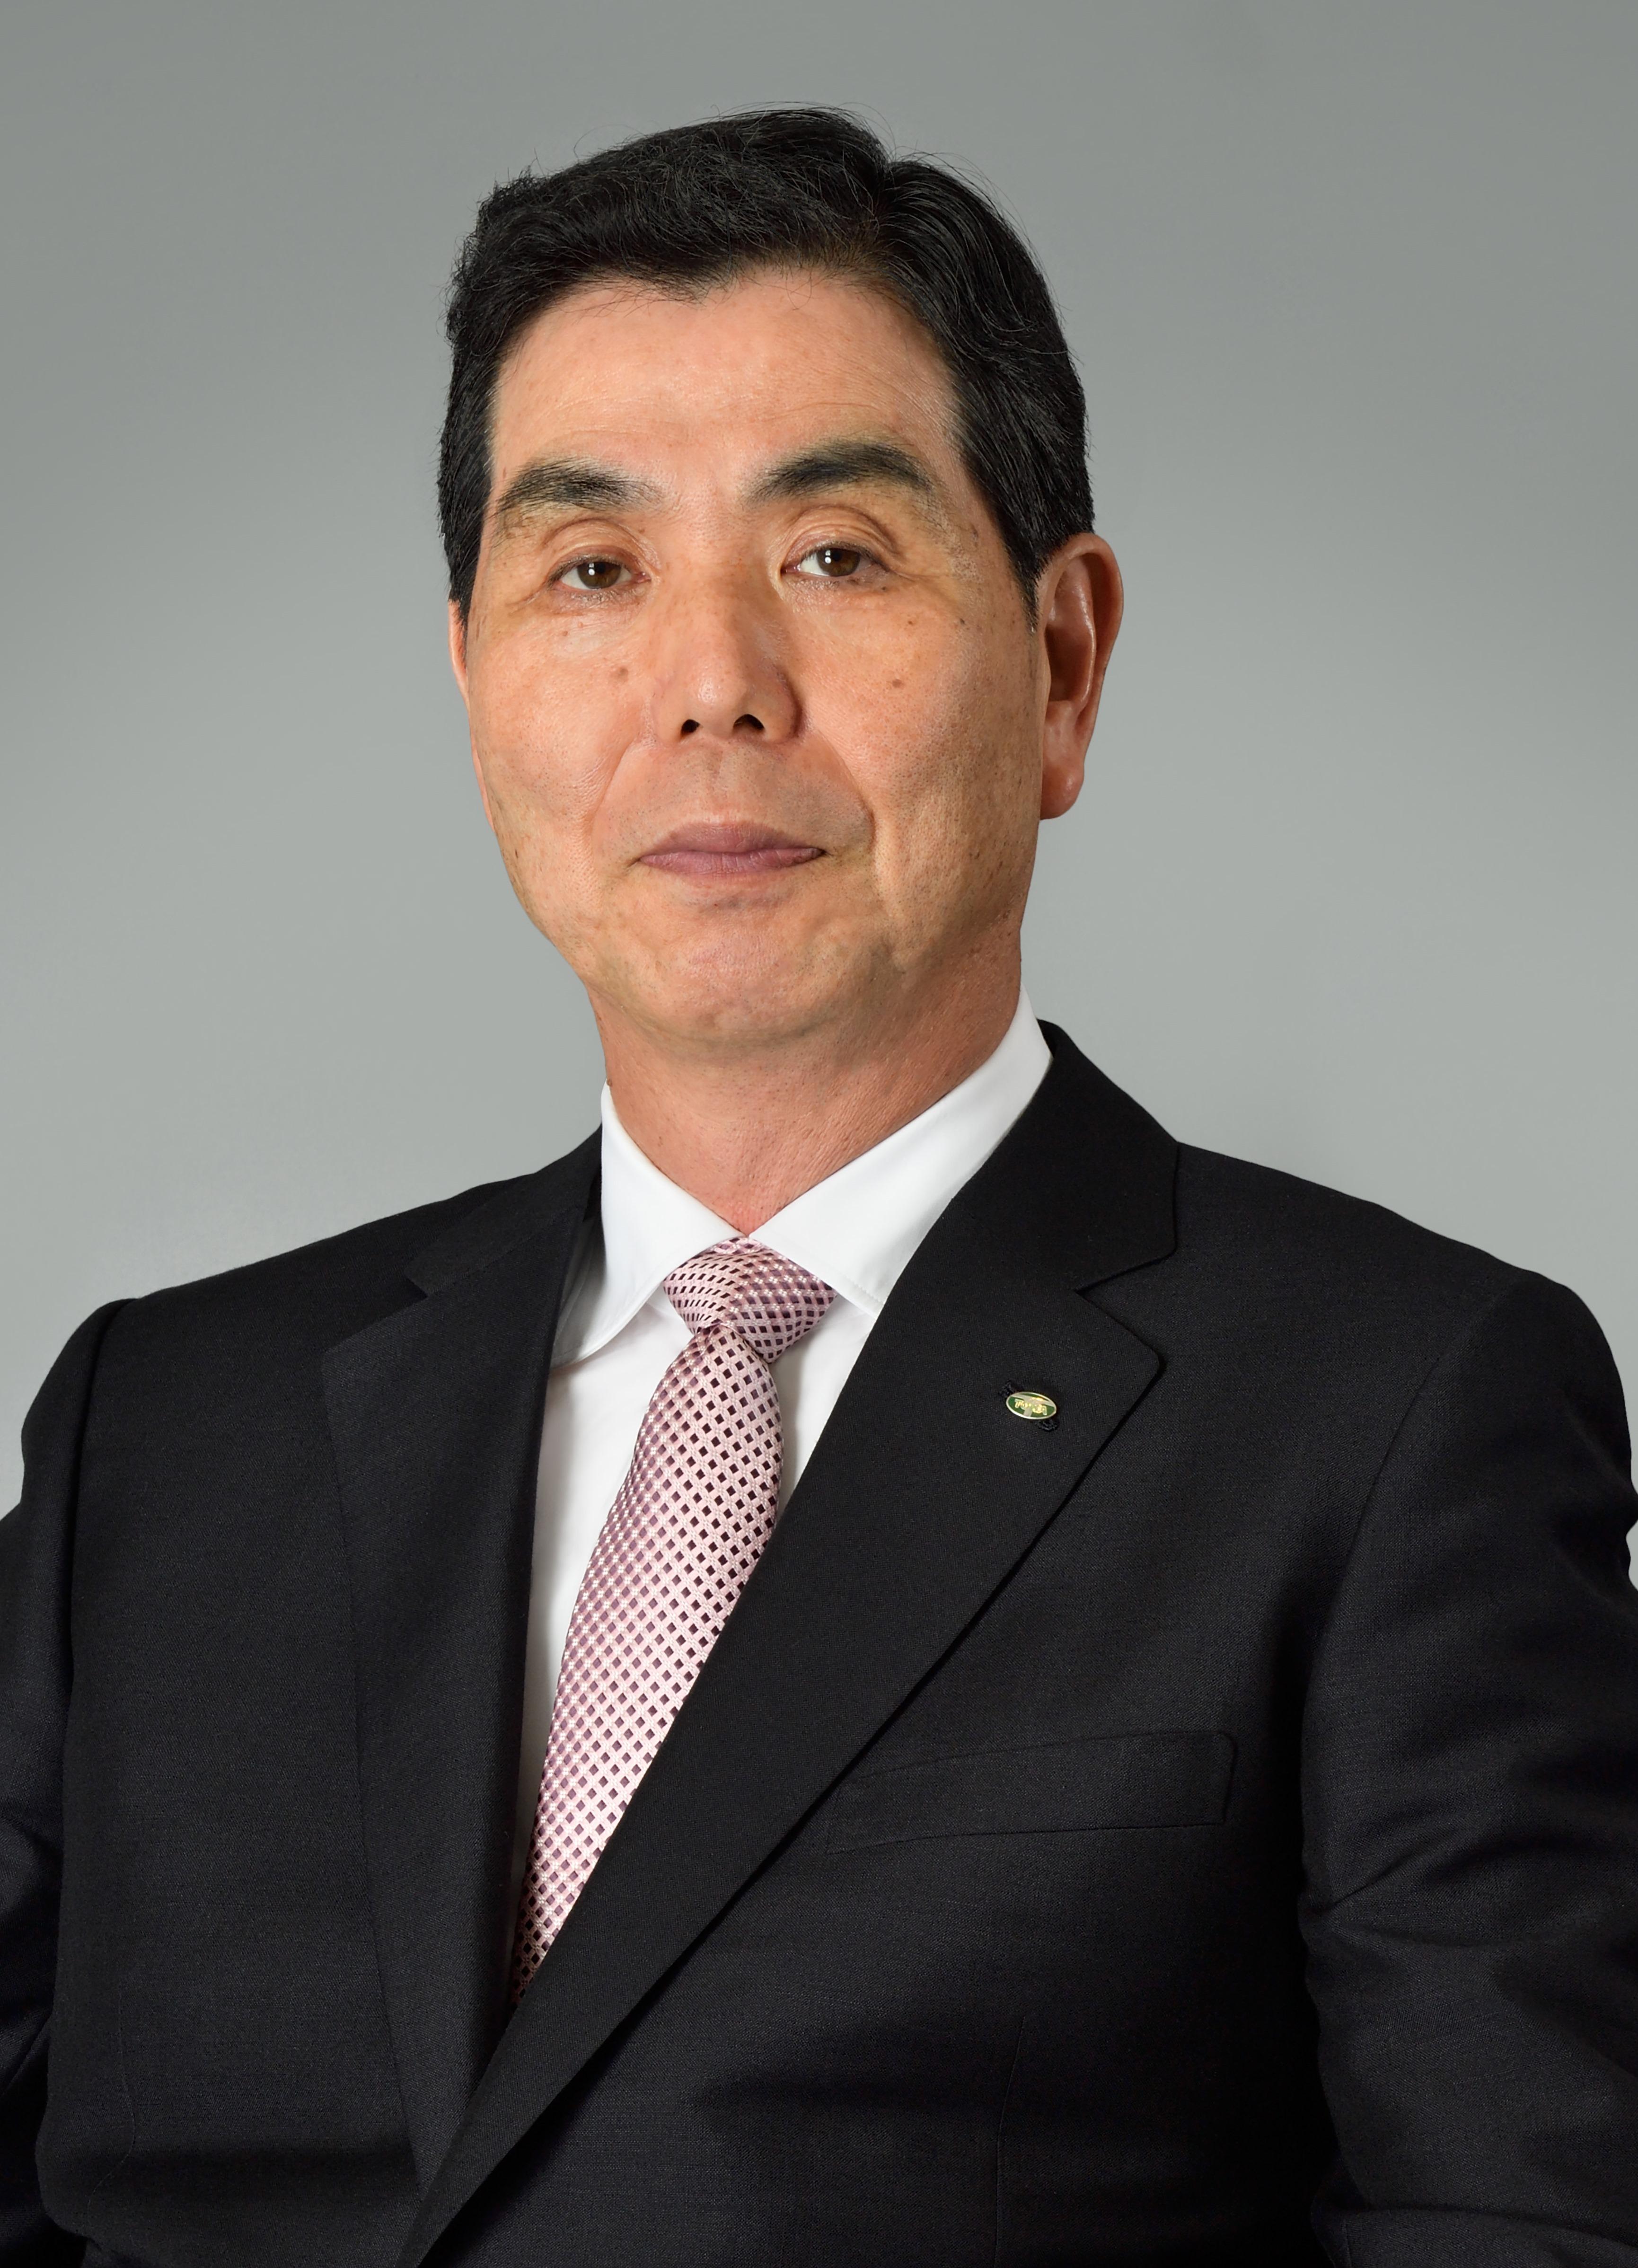 Itsuro Yoshida, President, Towa Pharmaceutical Co. Ltd.